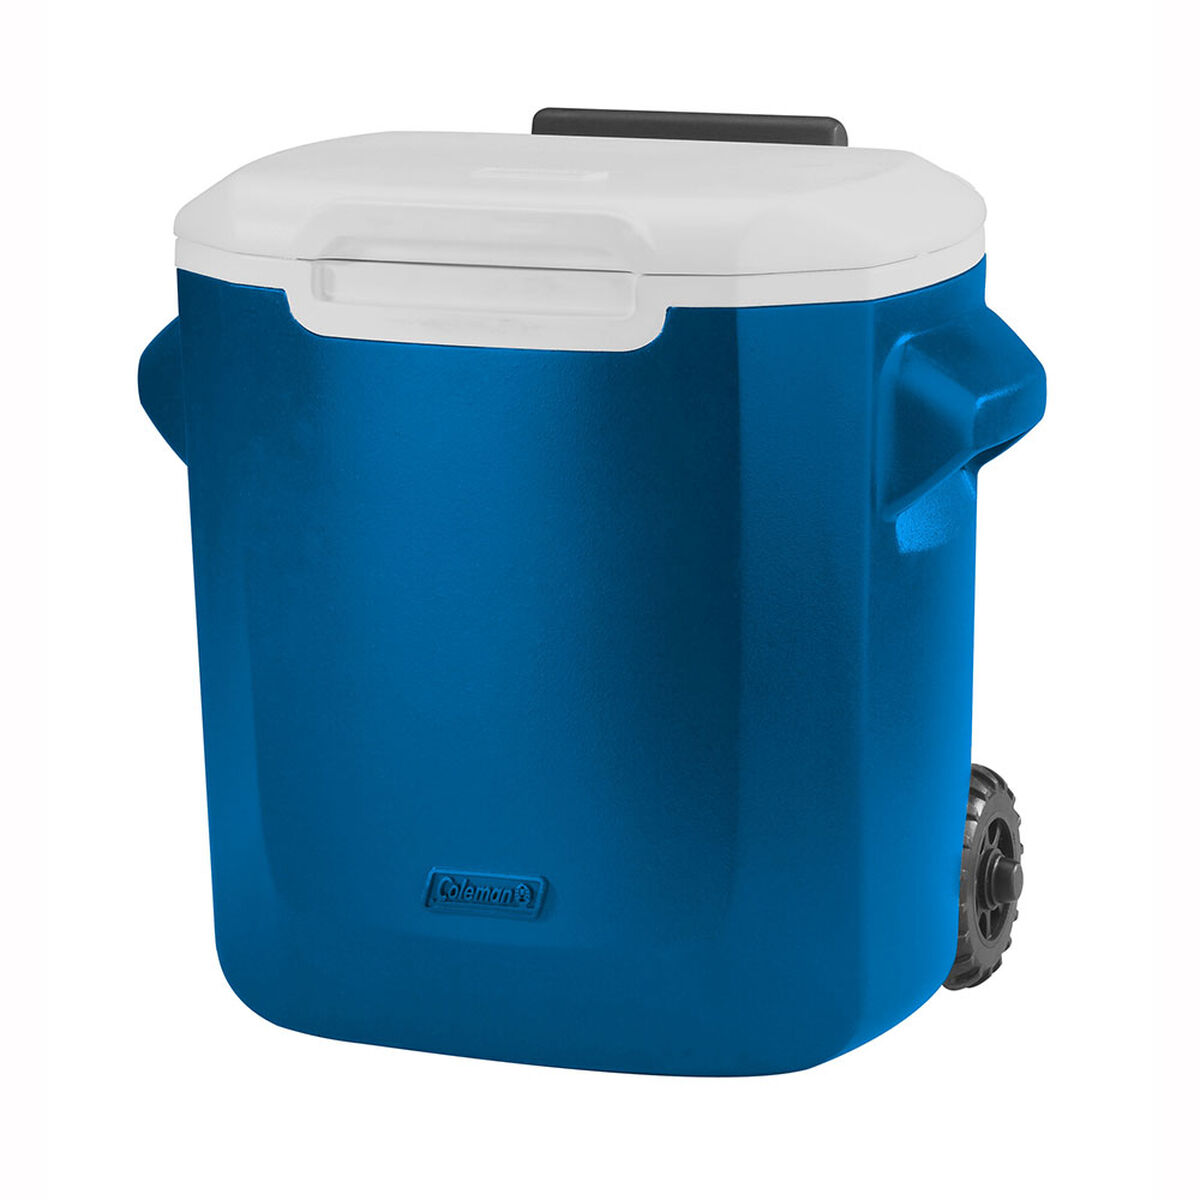 Hielera 16 Qt Con Ruedas Azul